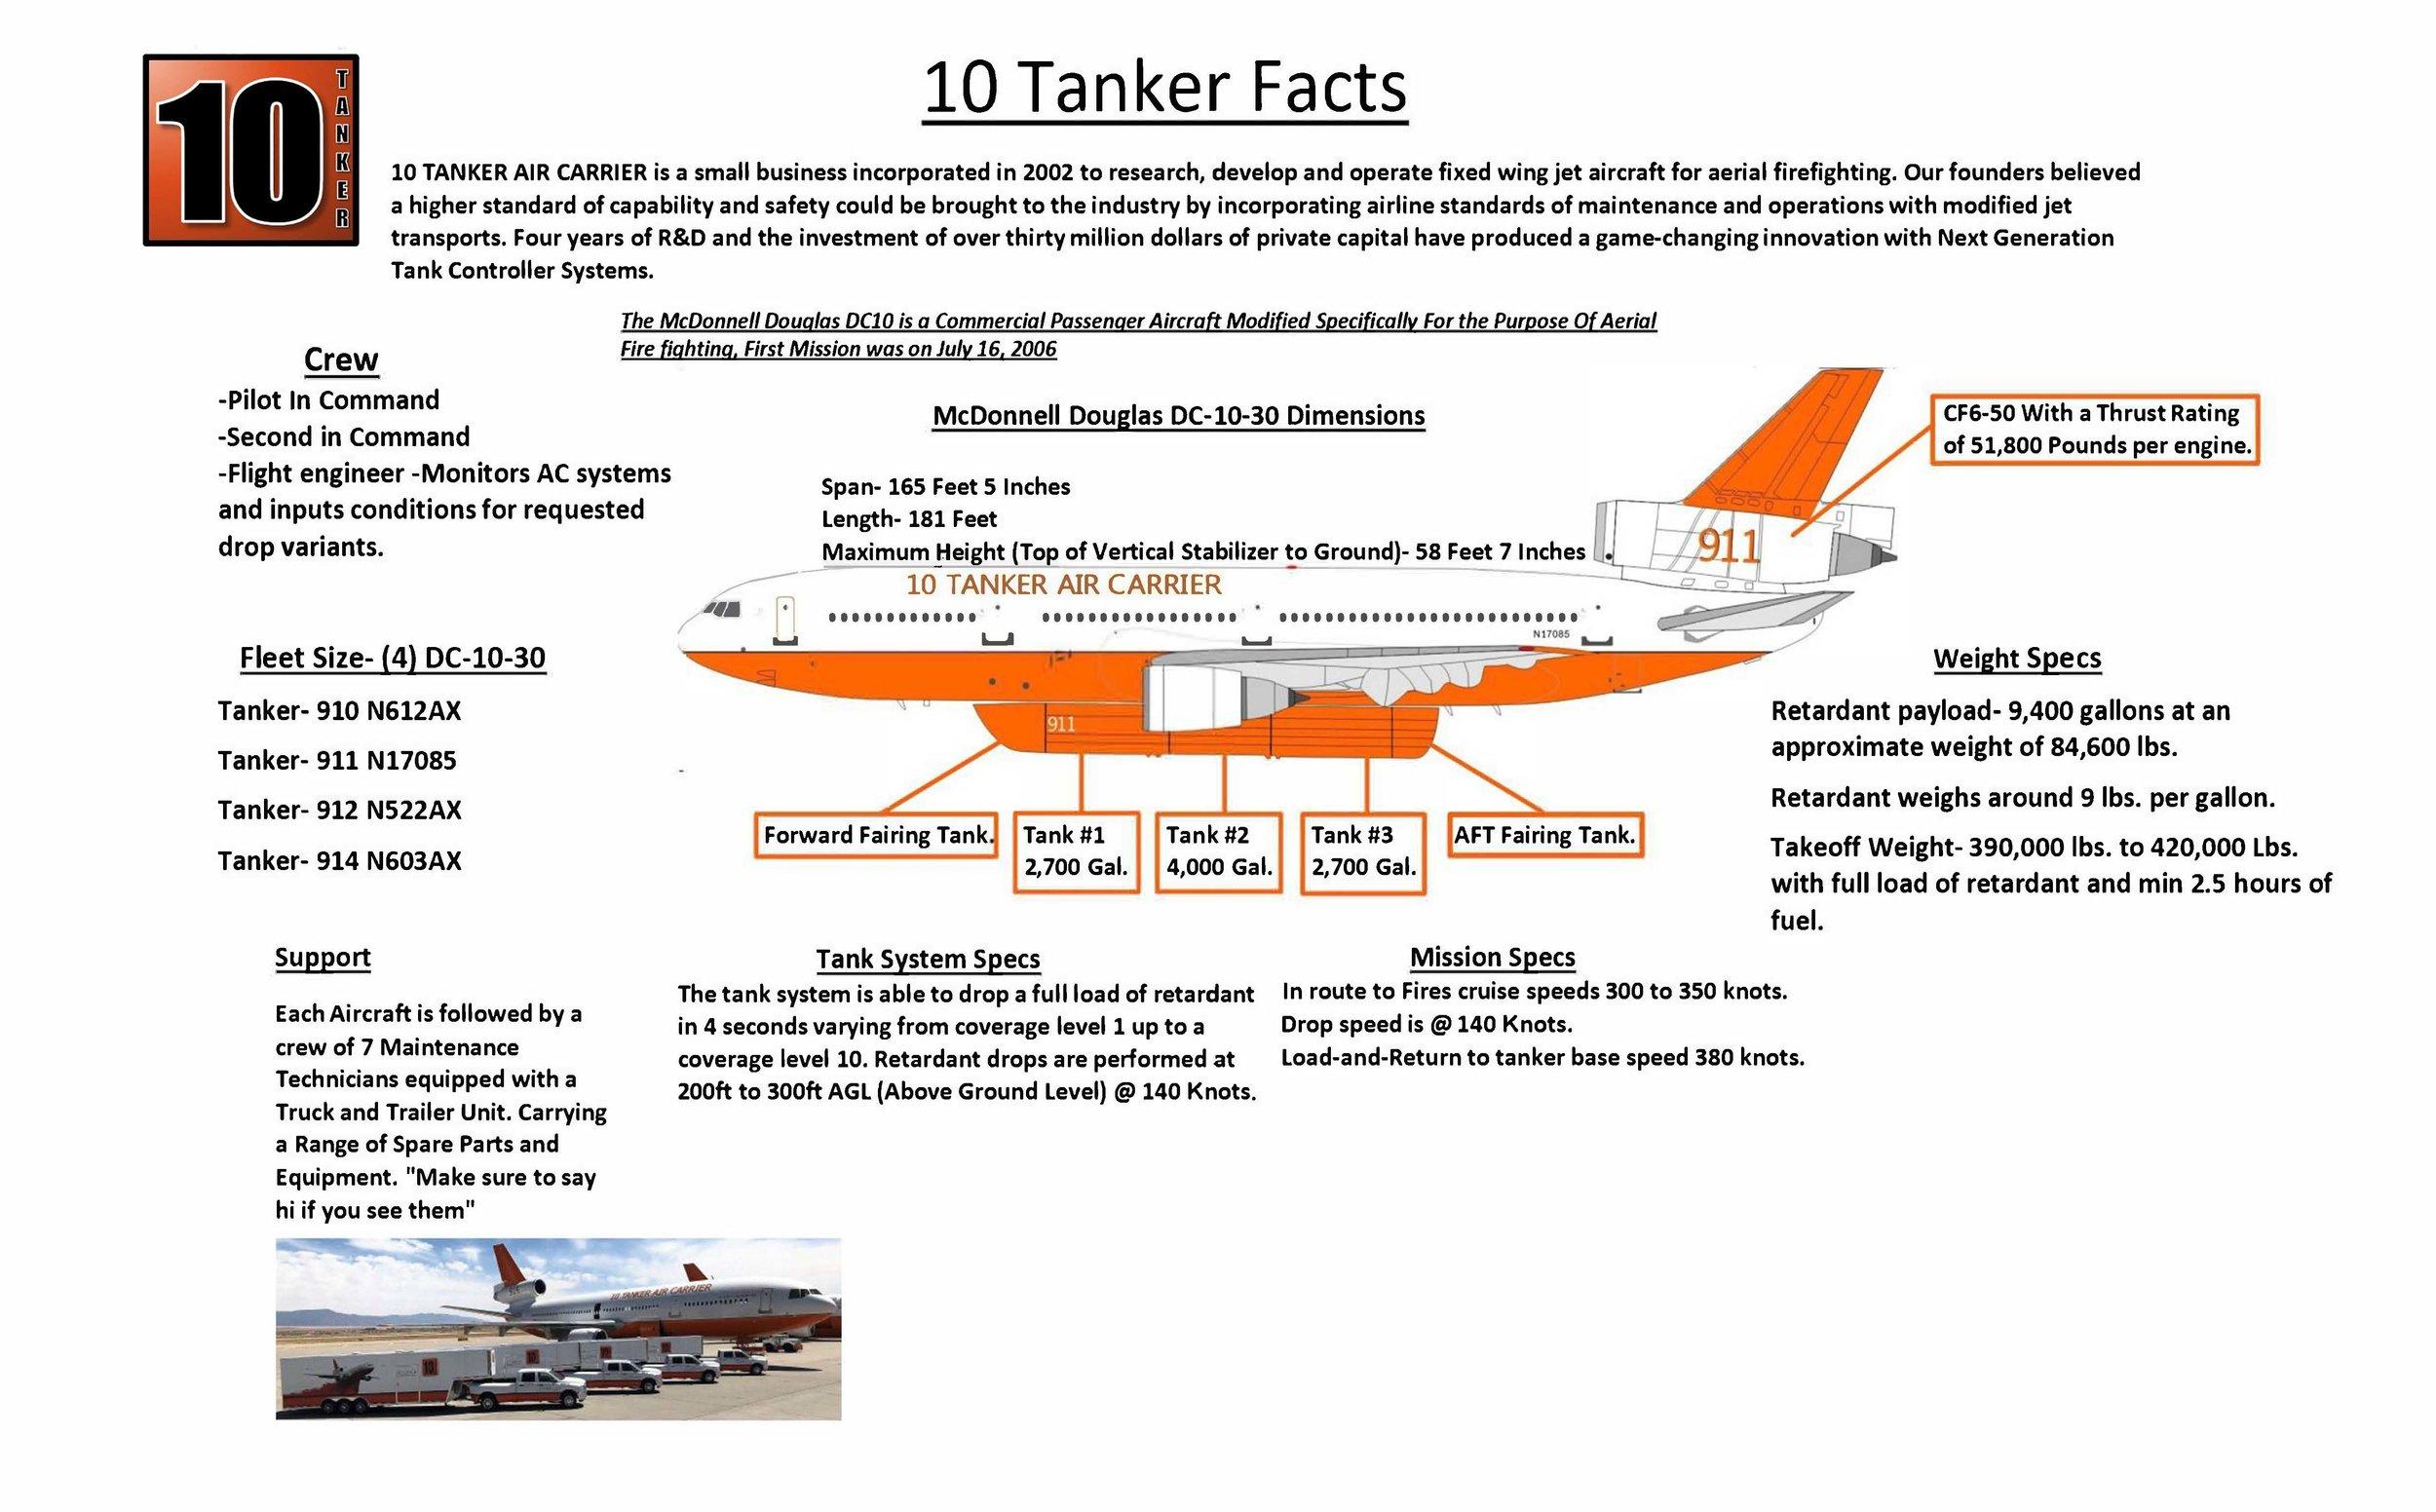 10+Tanker+Facts+Sheet+Rev+4+(18-Jun-19)+.jpg